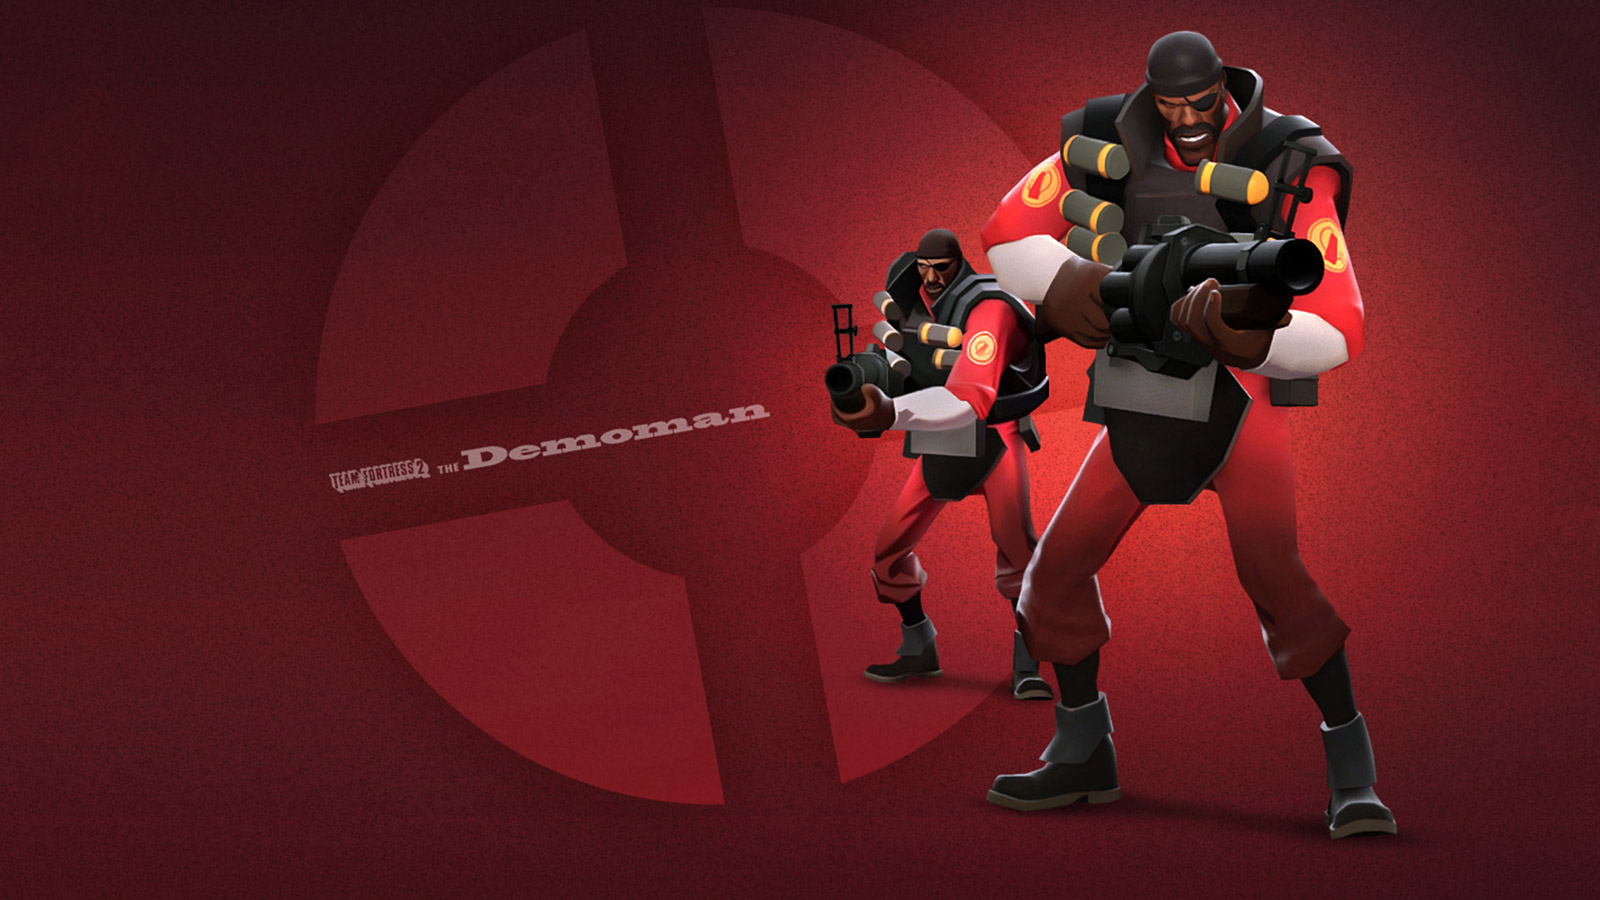 Team Fortress 2 Wallpaper in 1600x900